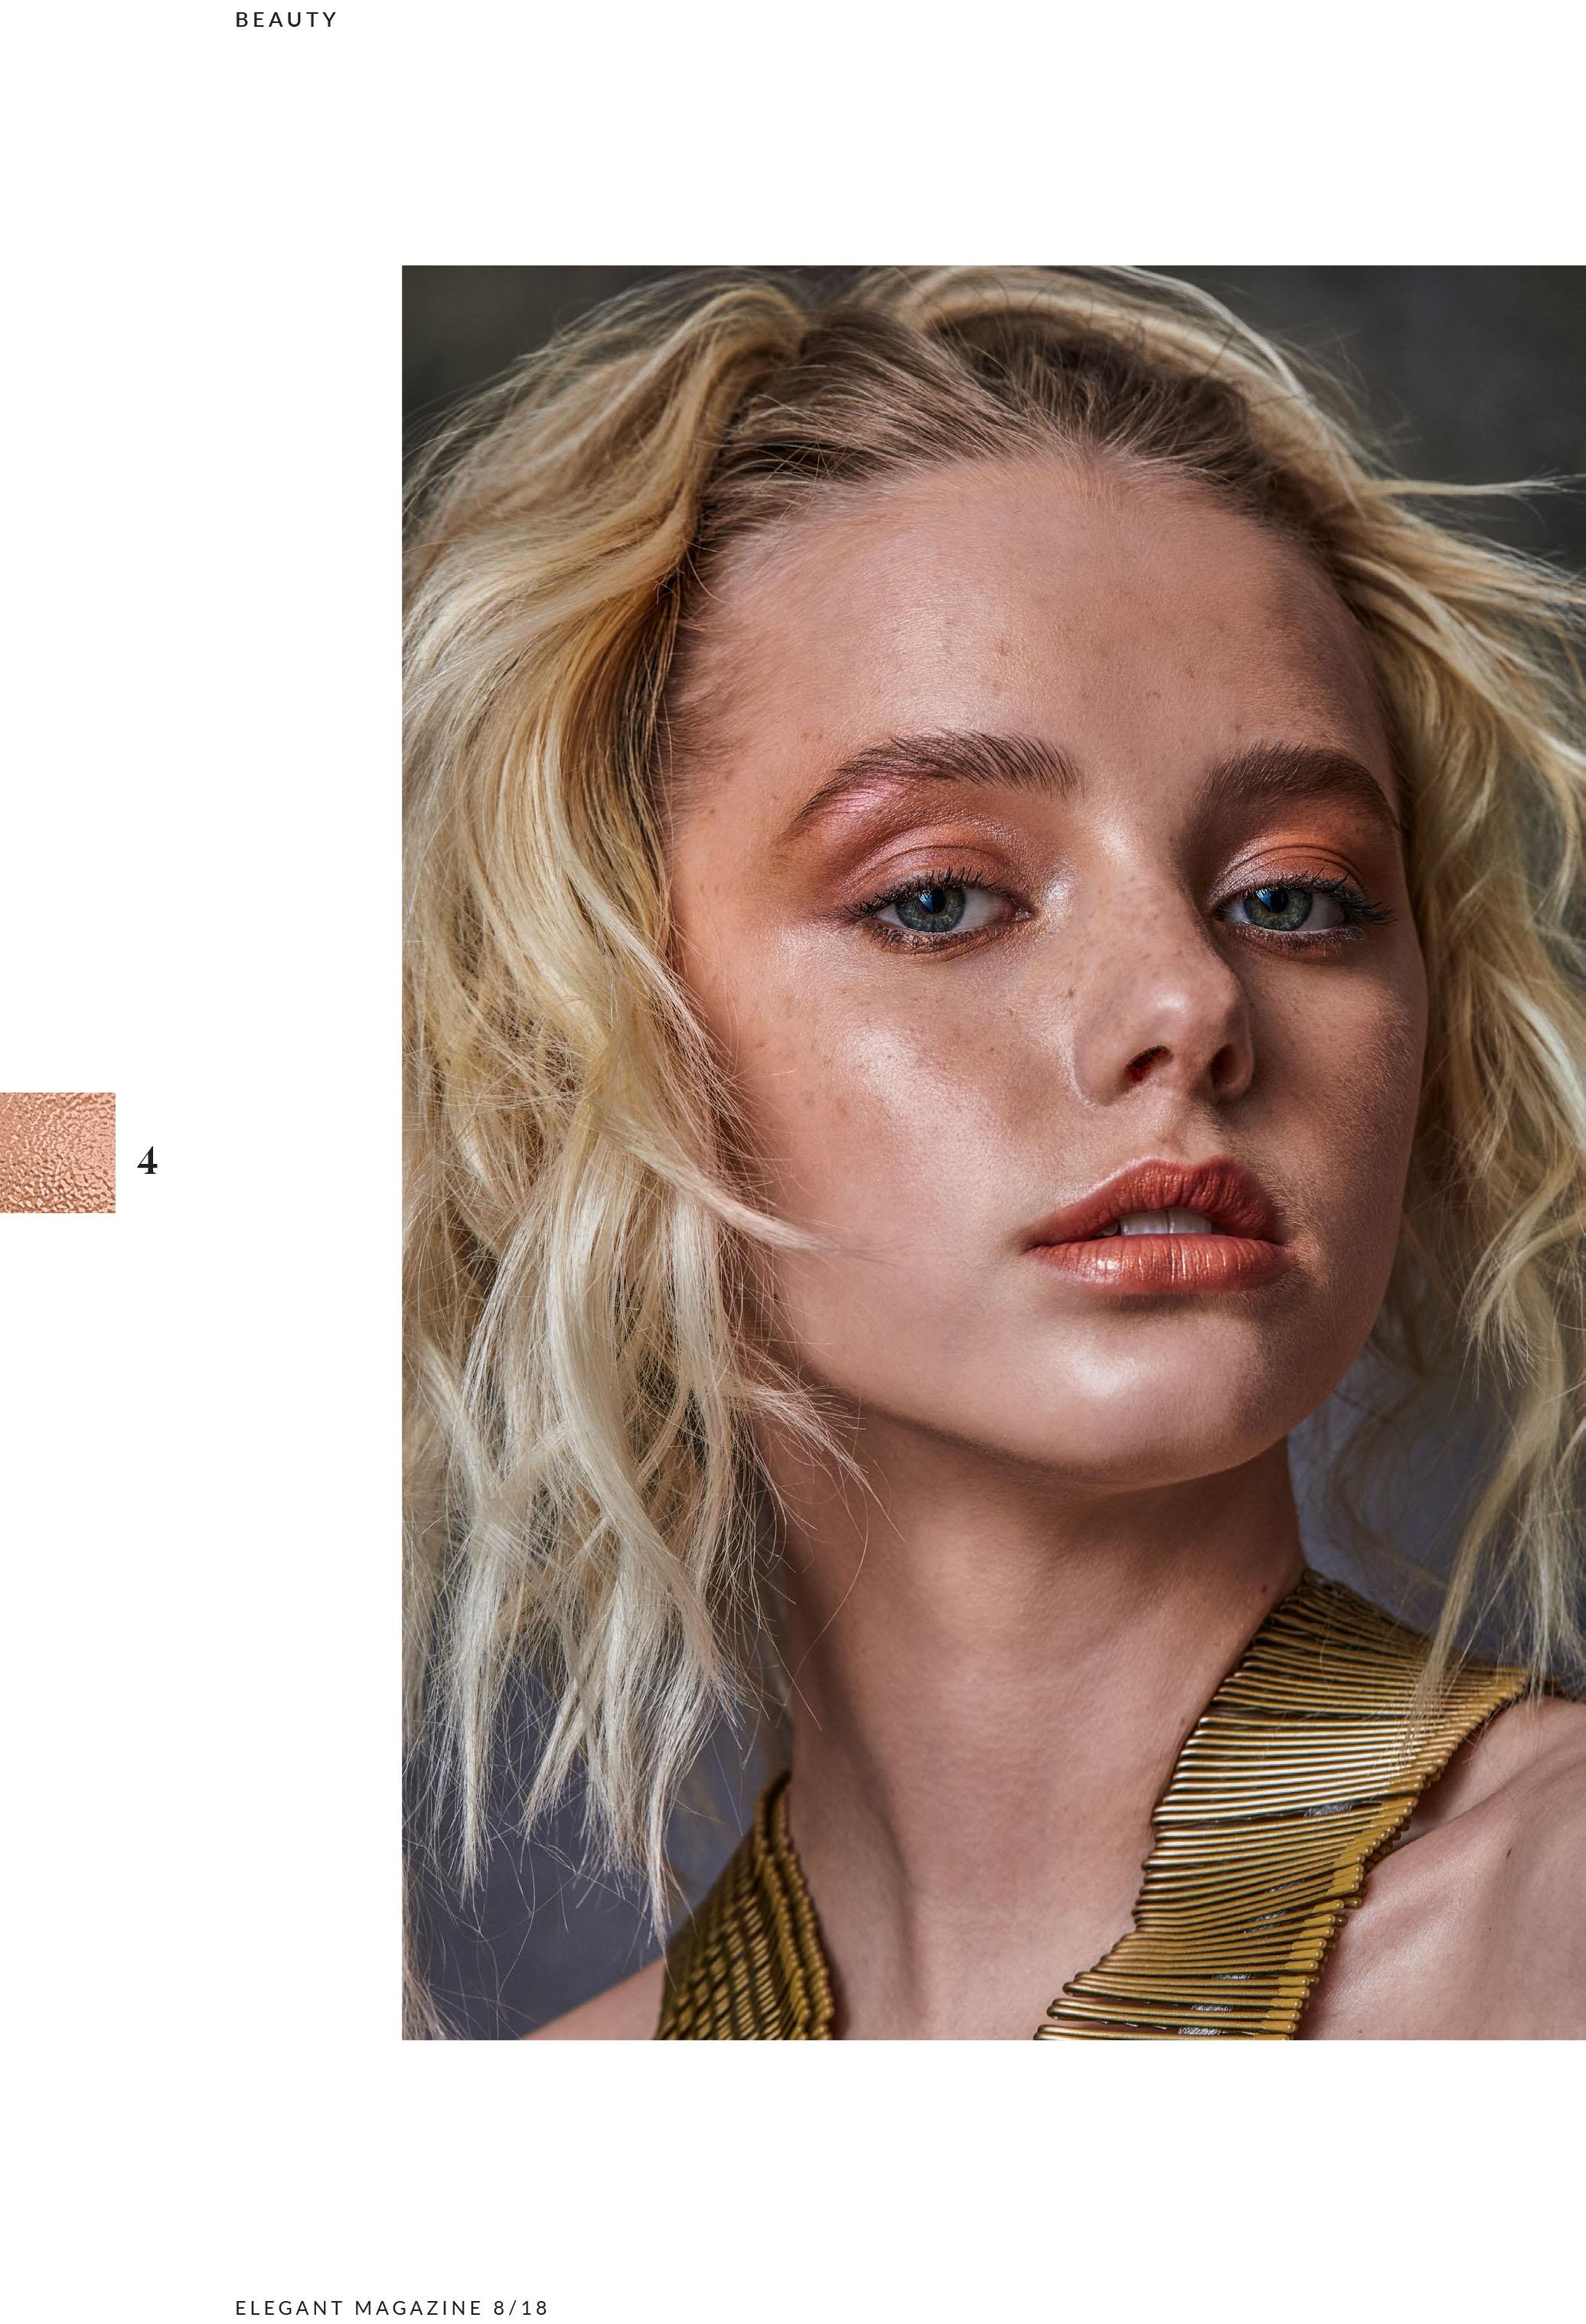 Joseph D Tran - Elegant Magazine - August 2018-4.jpg